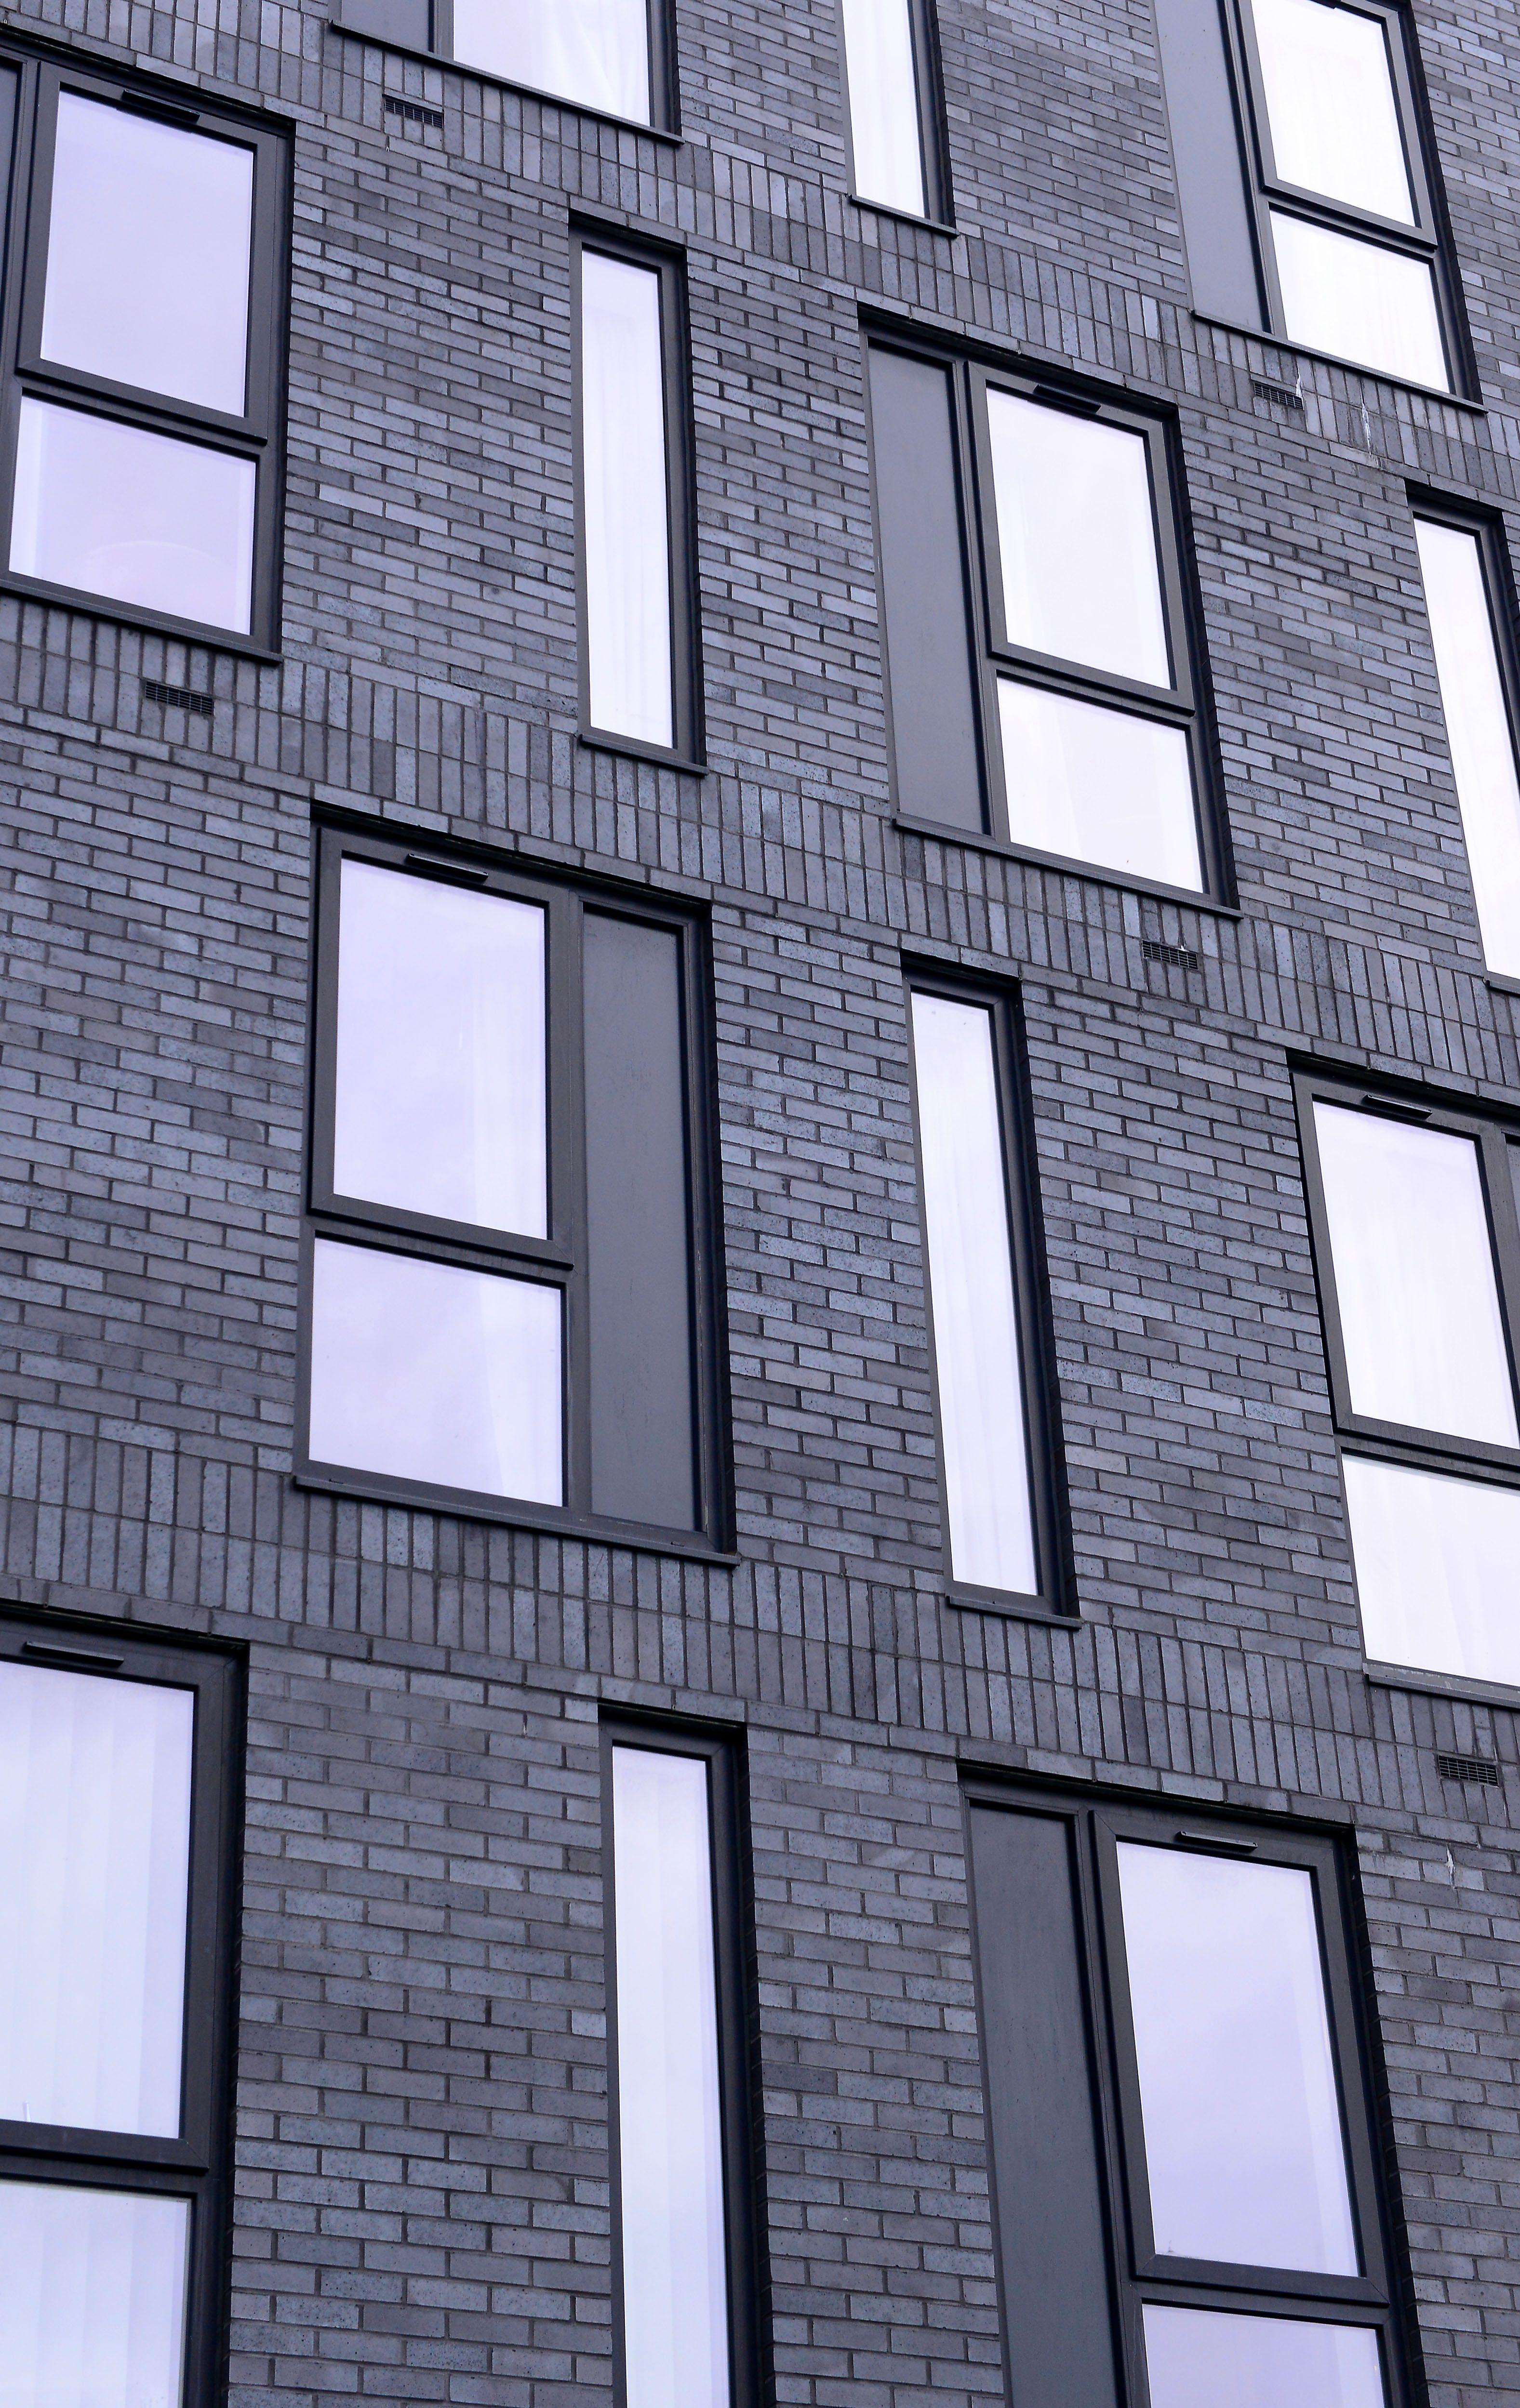 A Stunning Shot Of Our Anthracite Grey Modus Windows Modus Upvc Upvc Windows